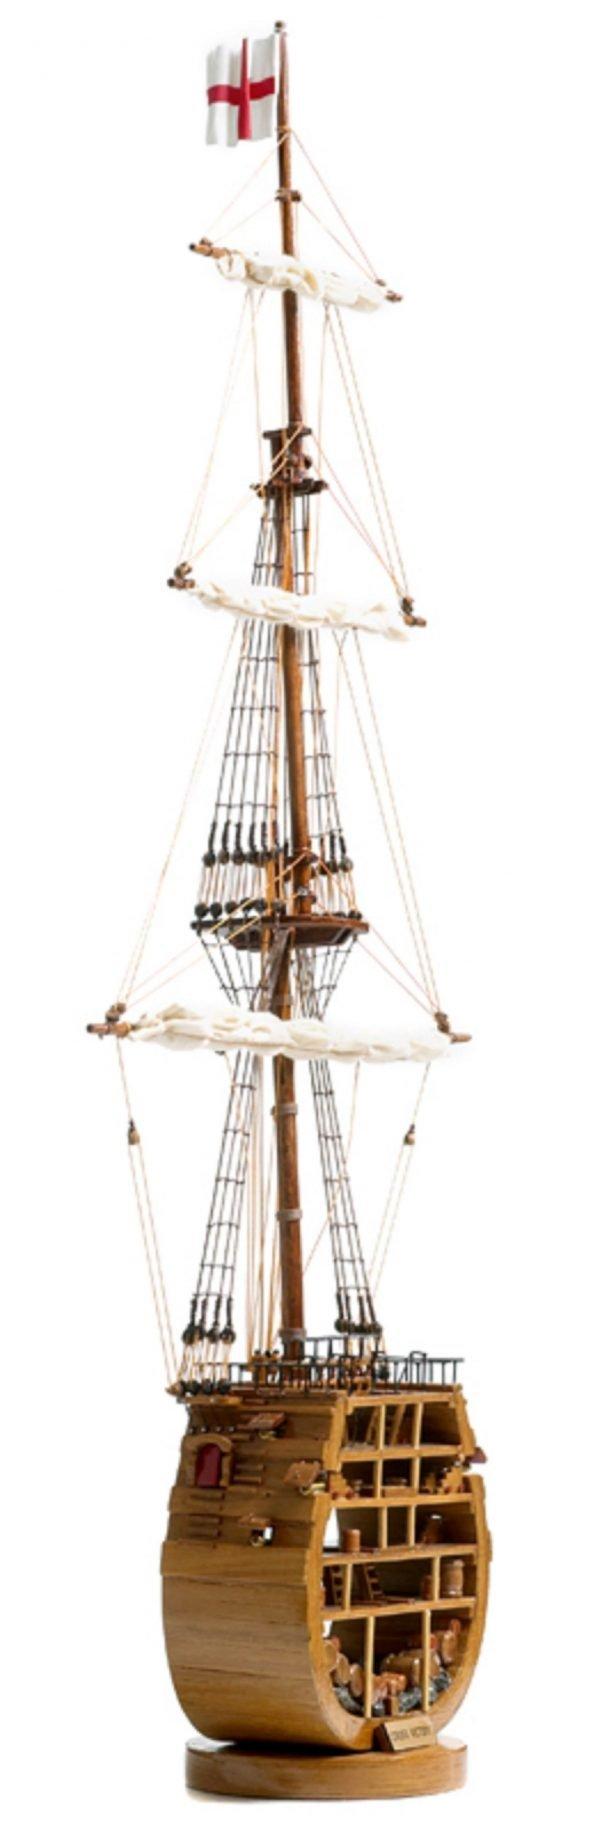 531-8364-HMS-Victory-Cross-Section-Model-Ship-Superior-Range